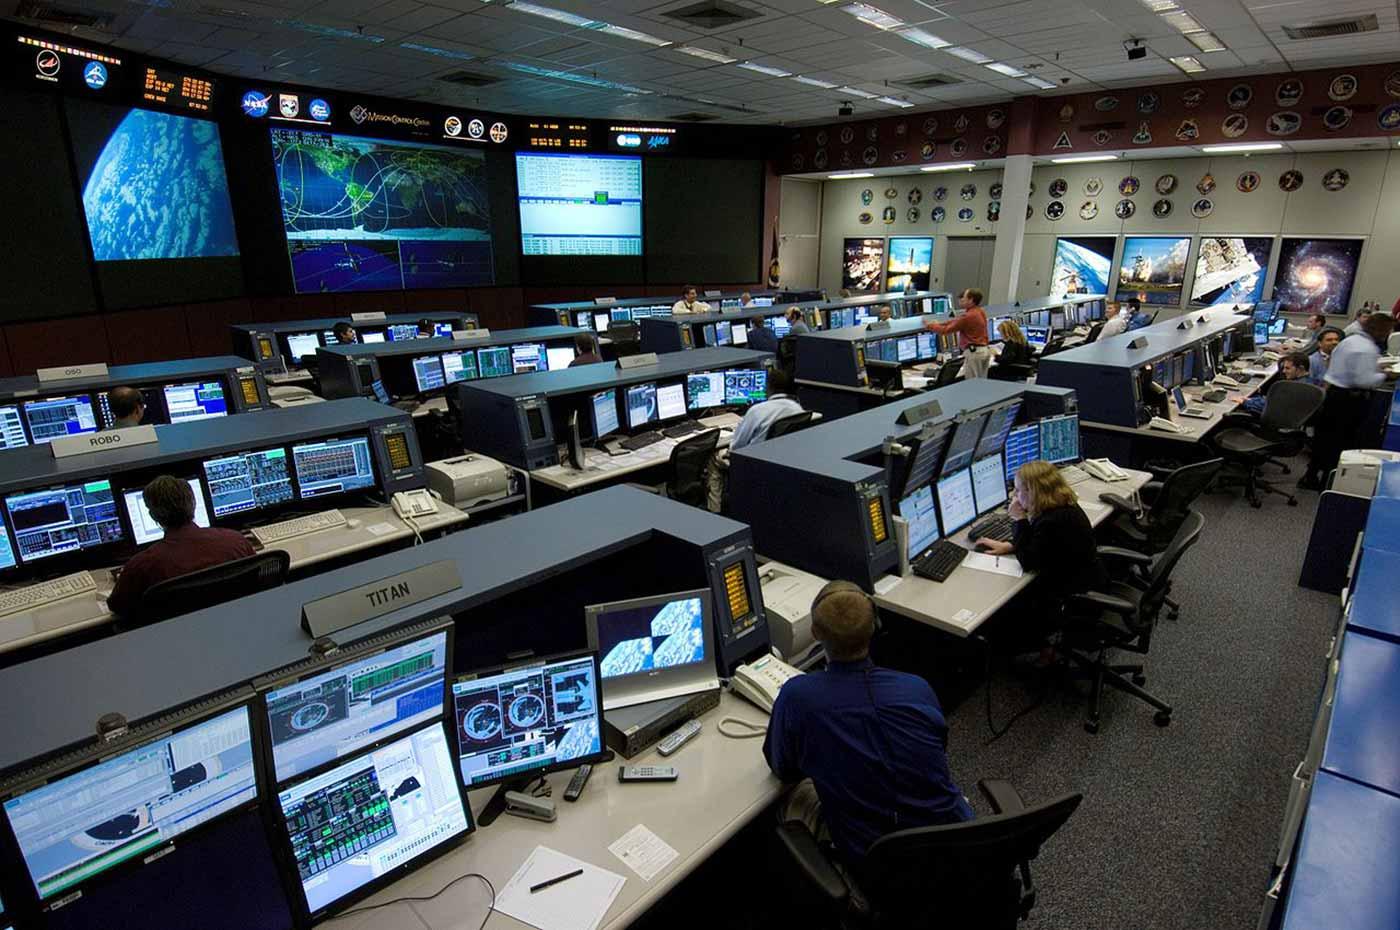 International Space Station control center